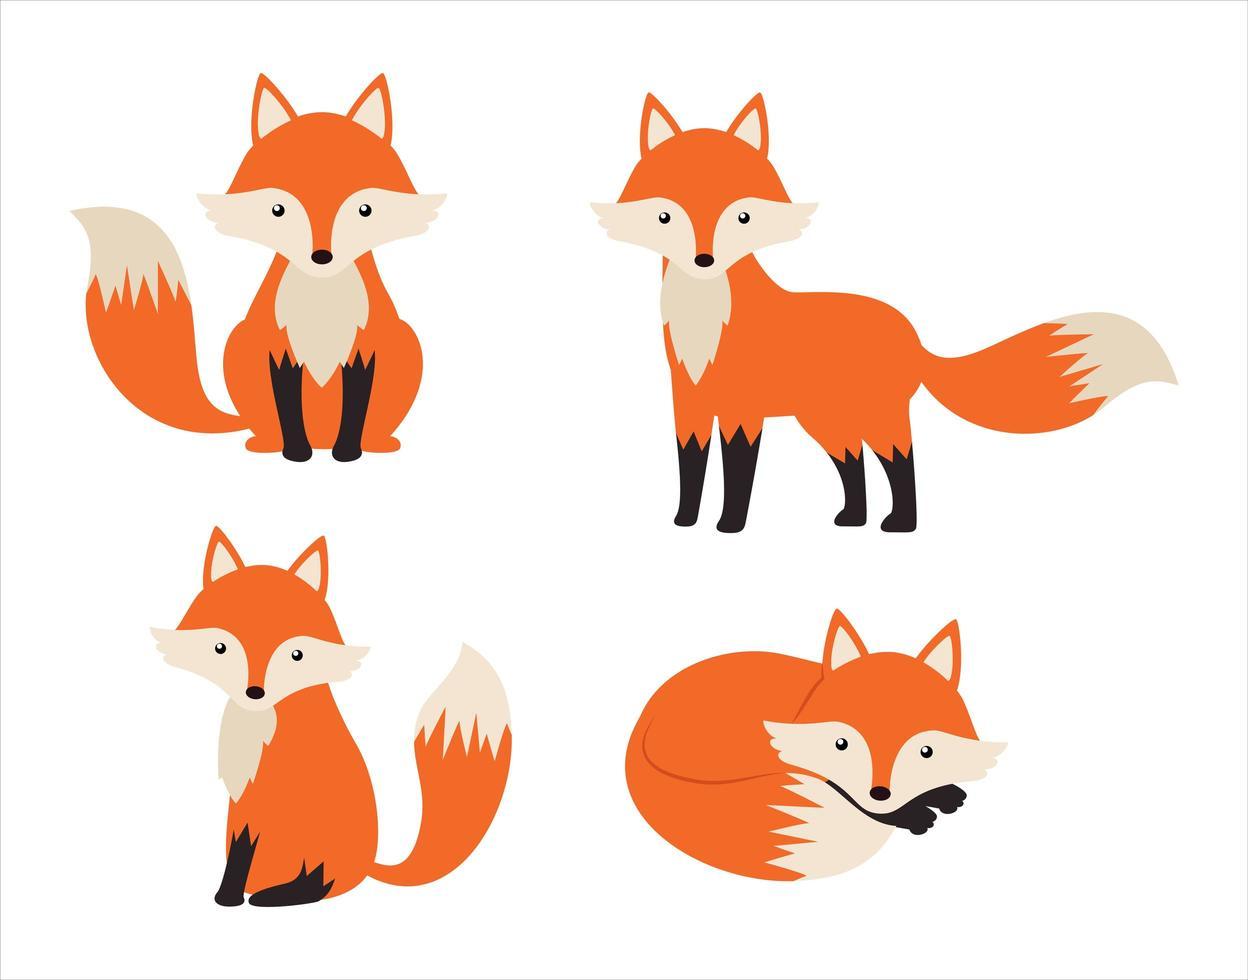 Bastelvorlagen Fuchs Gratis Vorlage Kinder Diy Trends 0